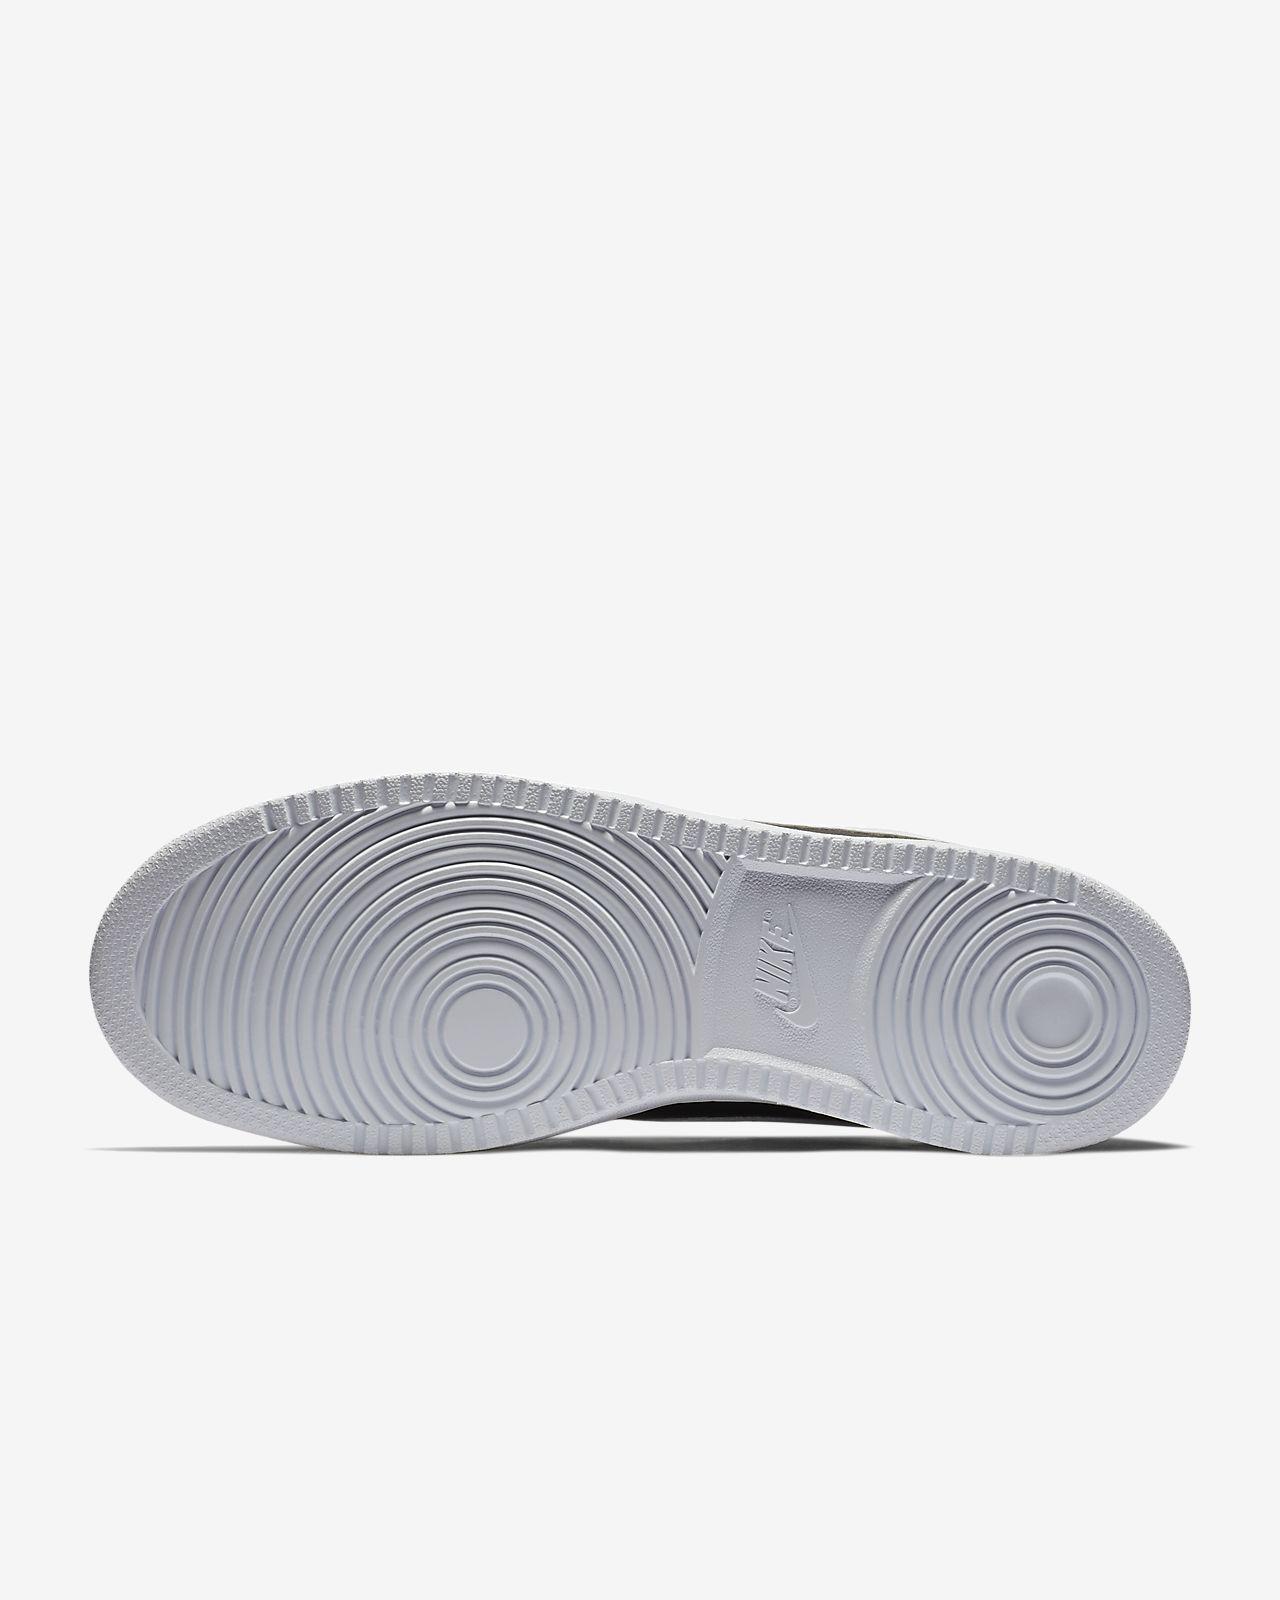 Sapatilhas Nike Ebernon Low para homem